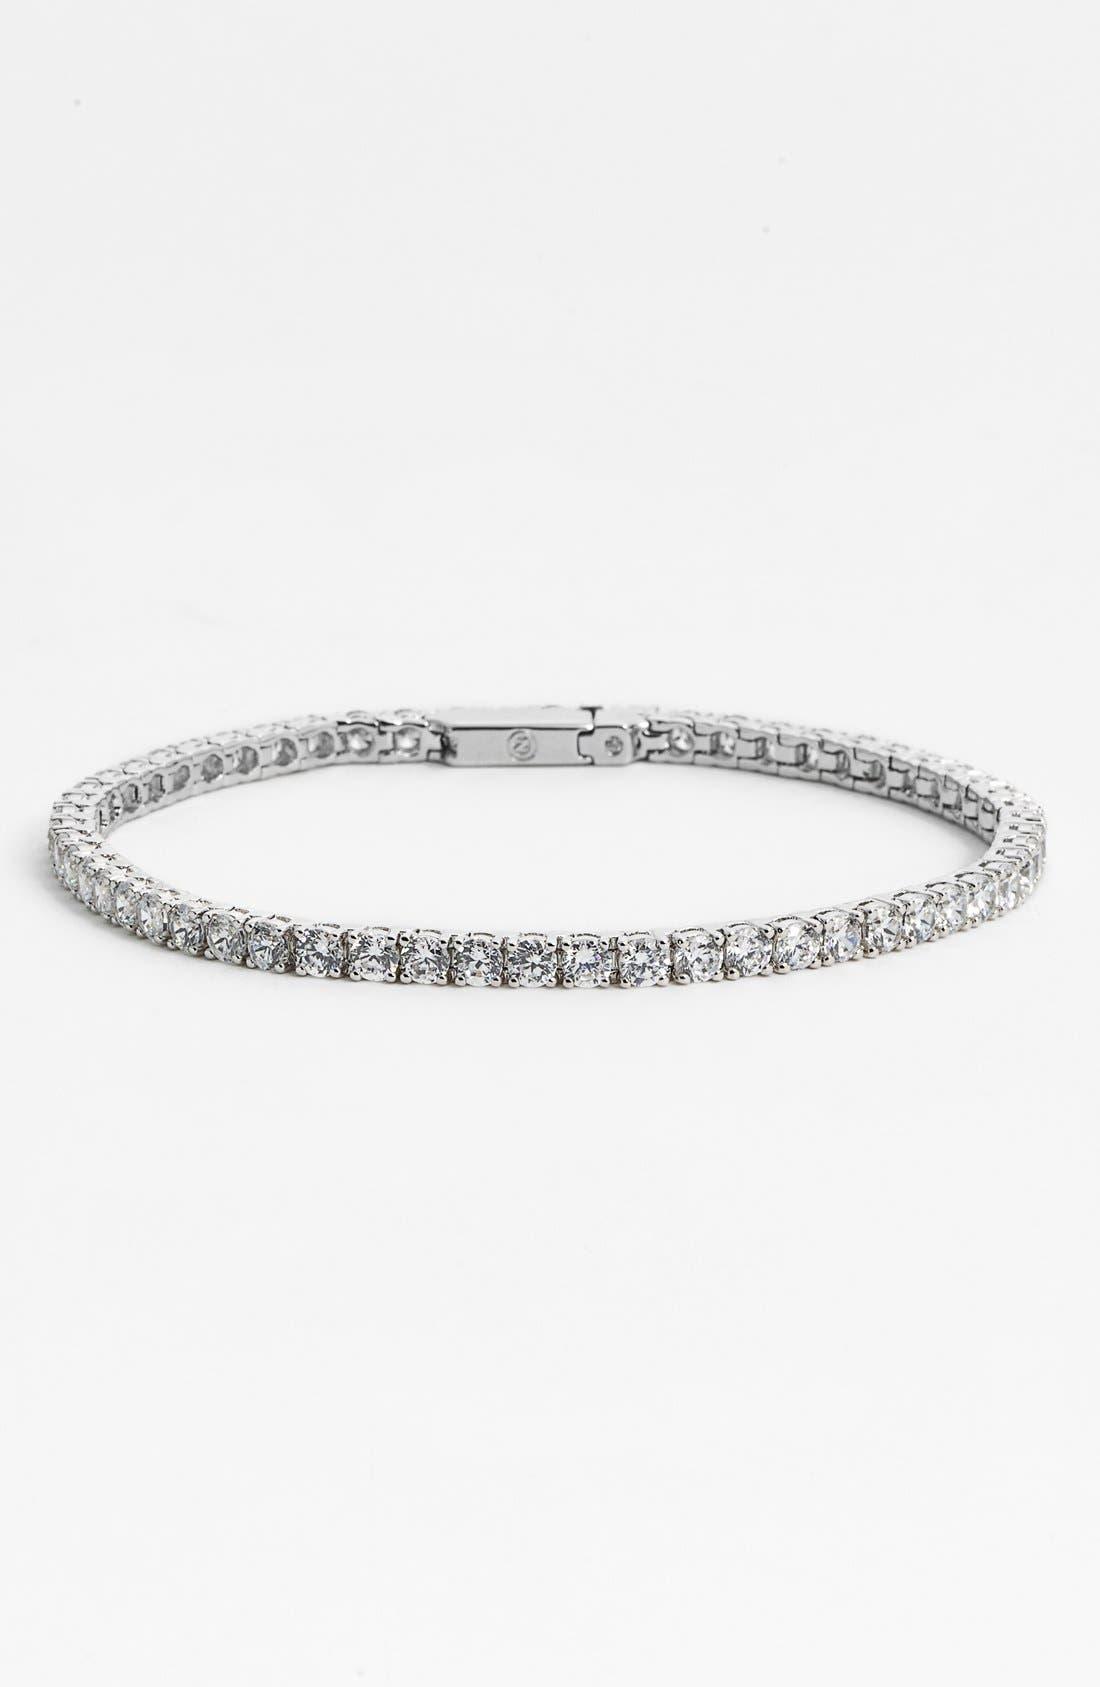 Alternate Image 1 Selected - Nadri Small Tennis Bracelet